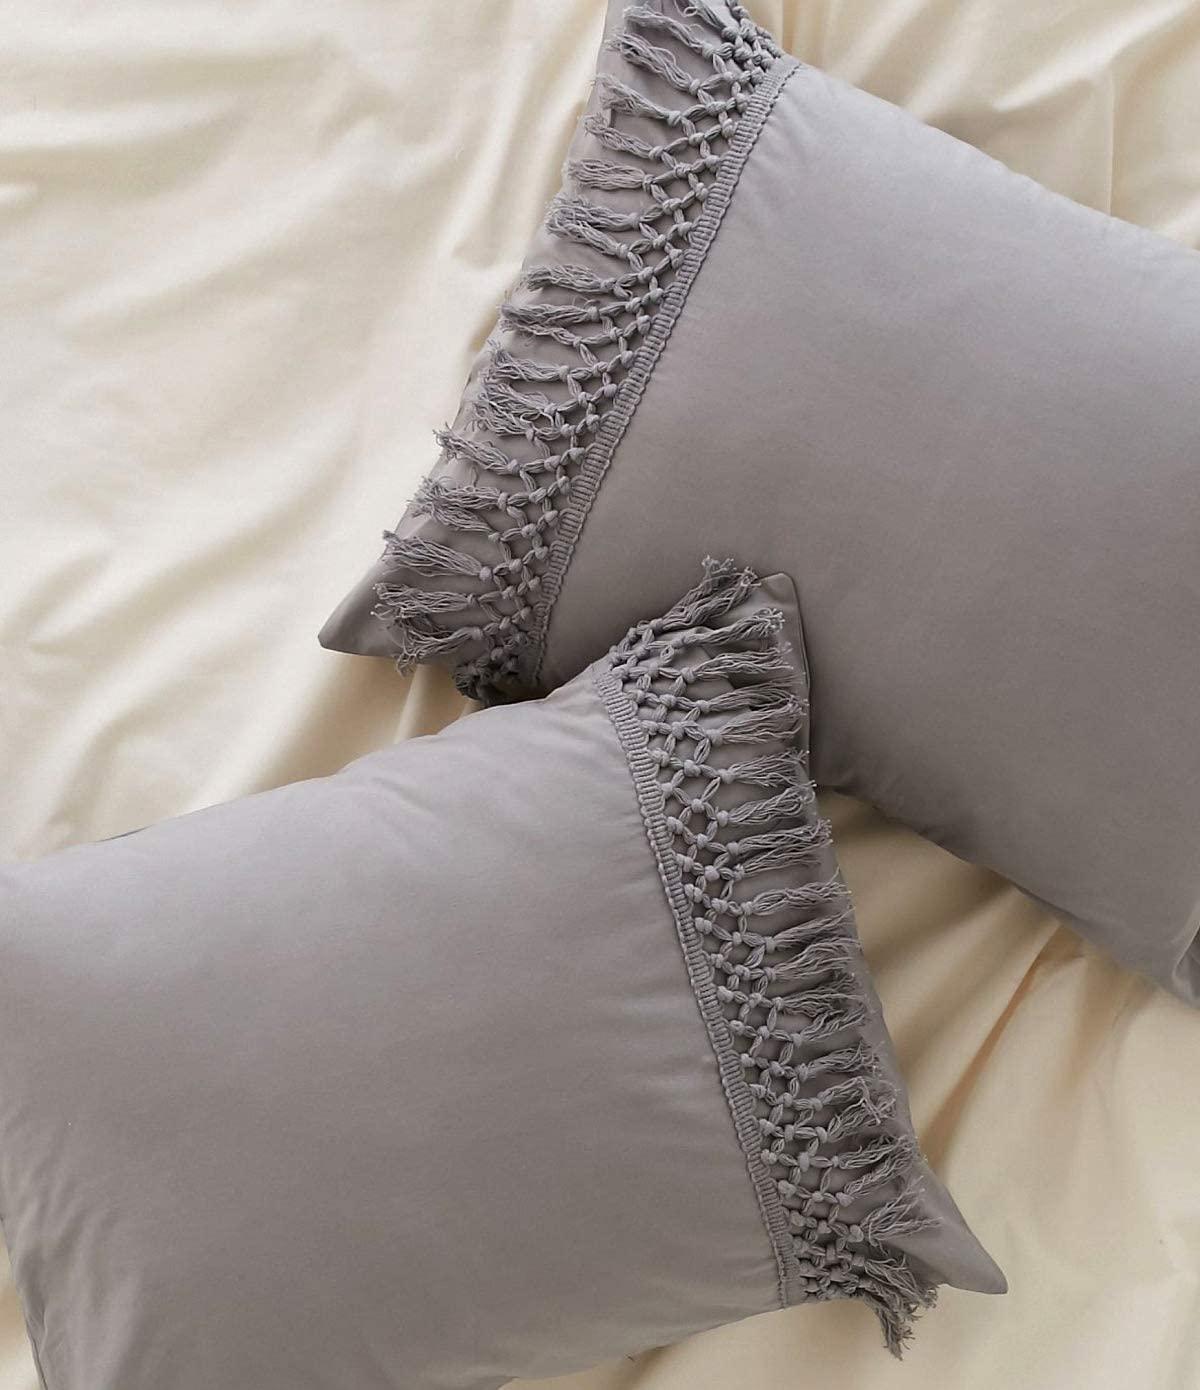 Flber Gray Tassel Sham Boho Pillowcases Cotton Pillow Covers,Set of 2,18.9in x29.1in (Gray Queen)